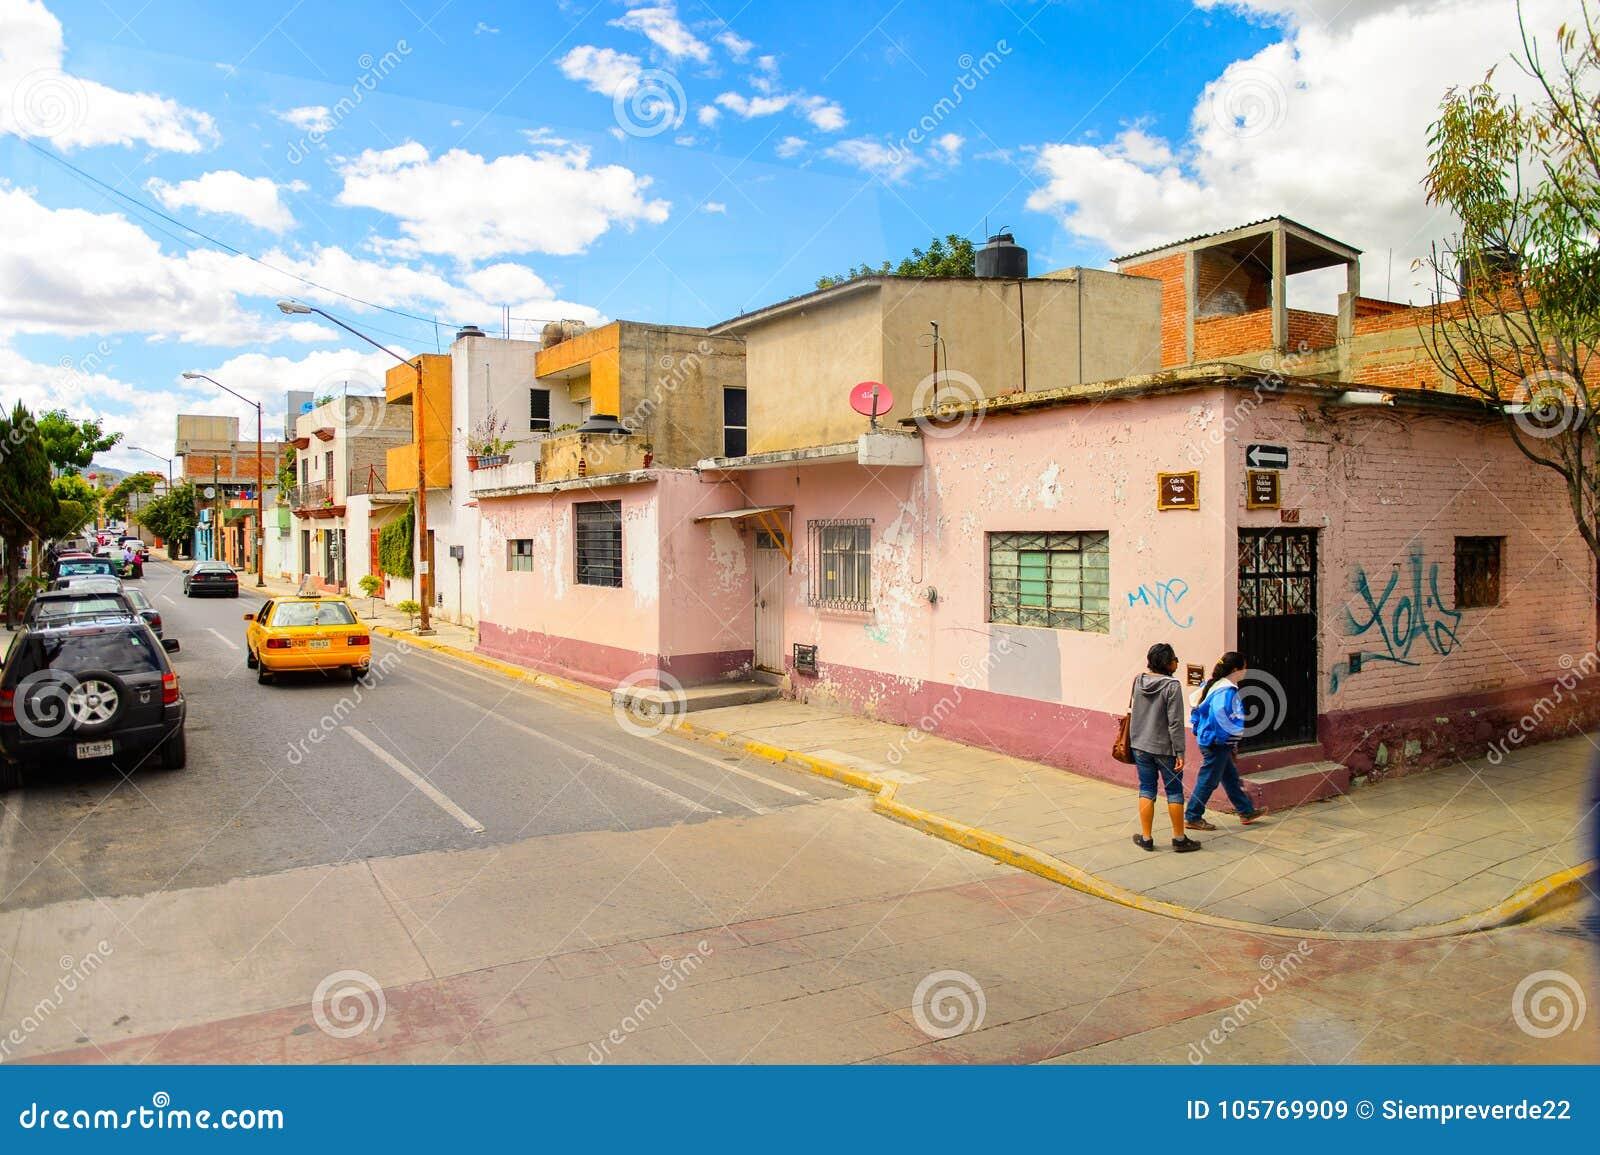 Architecture of Oaxaca